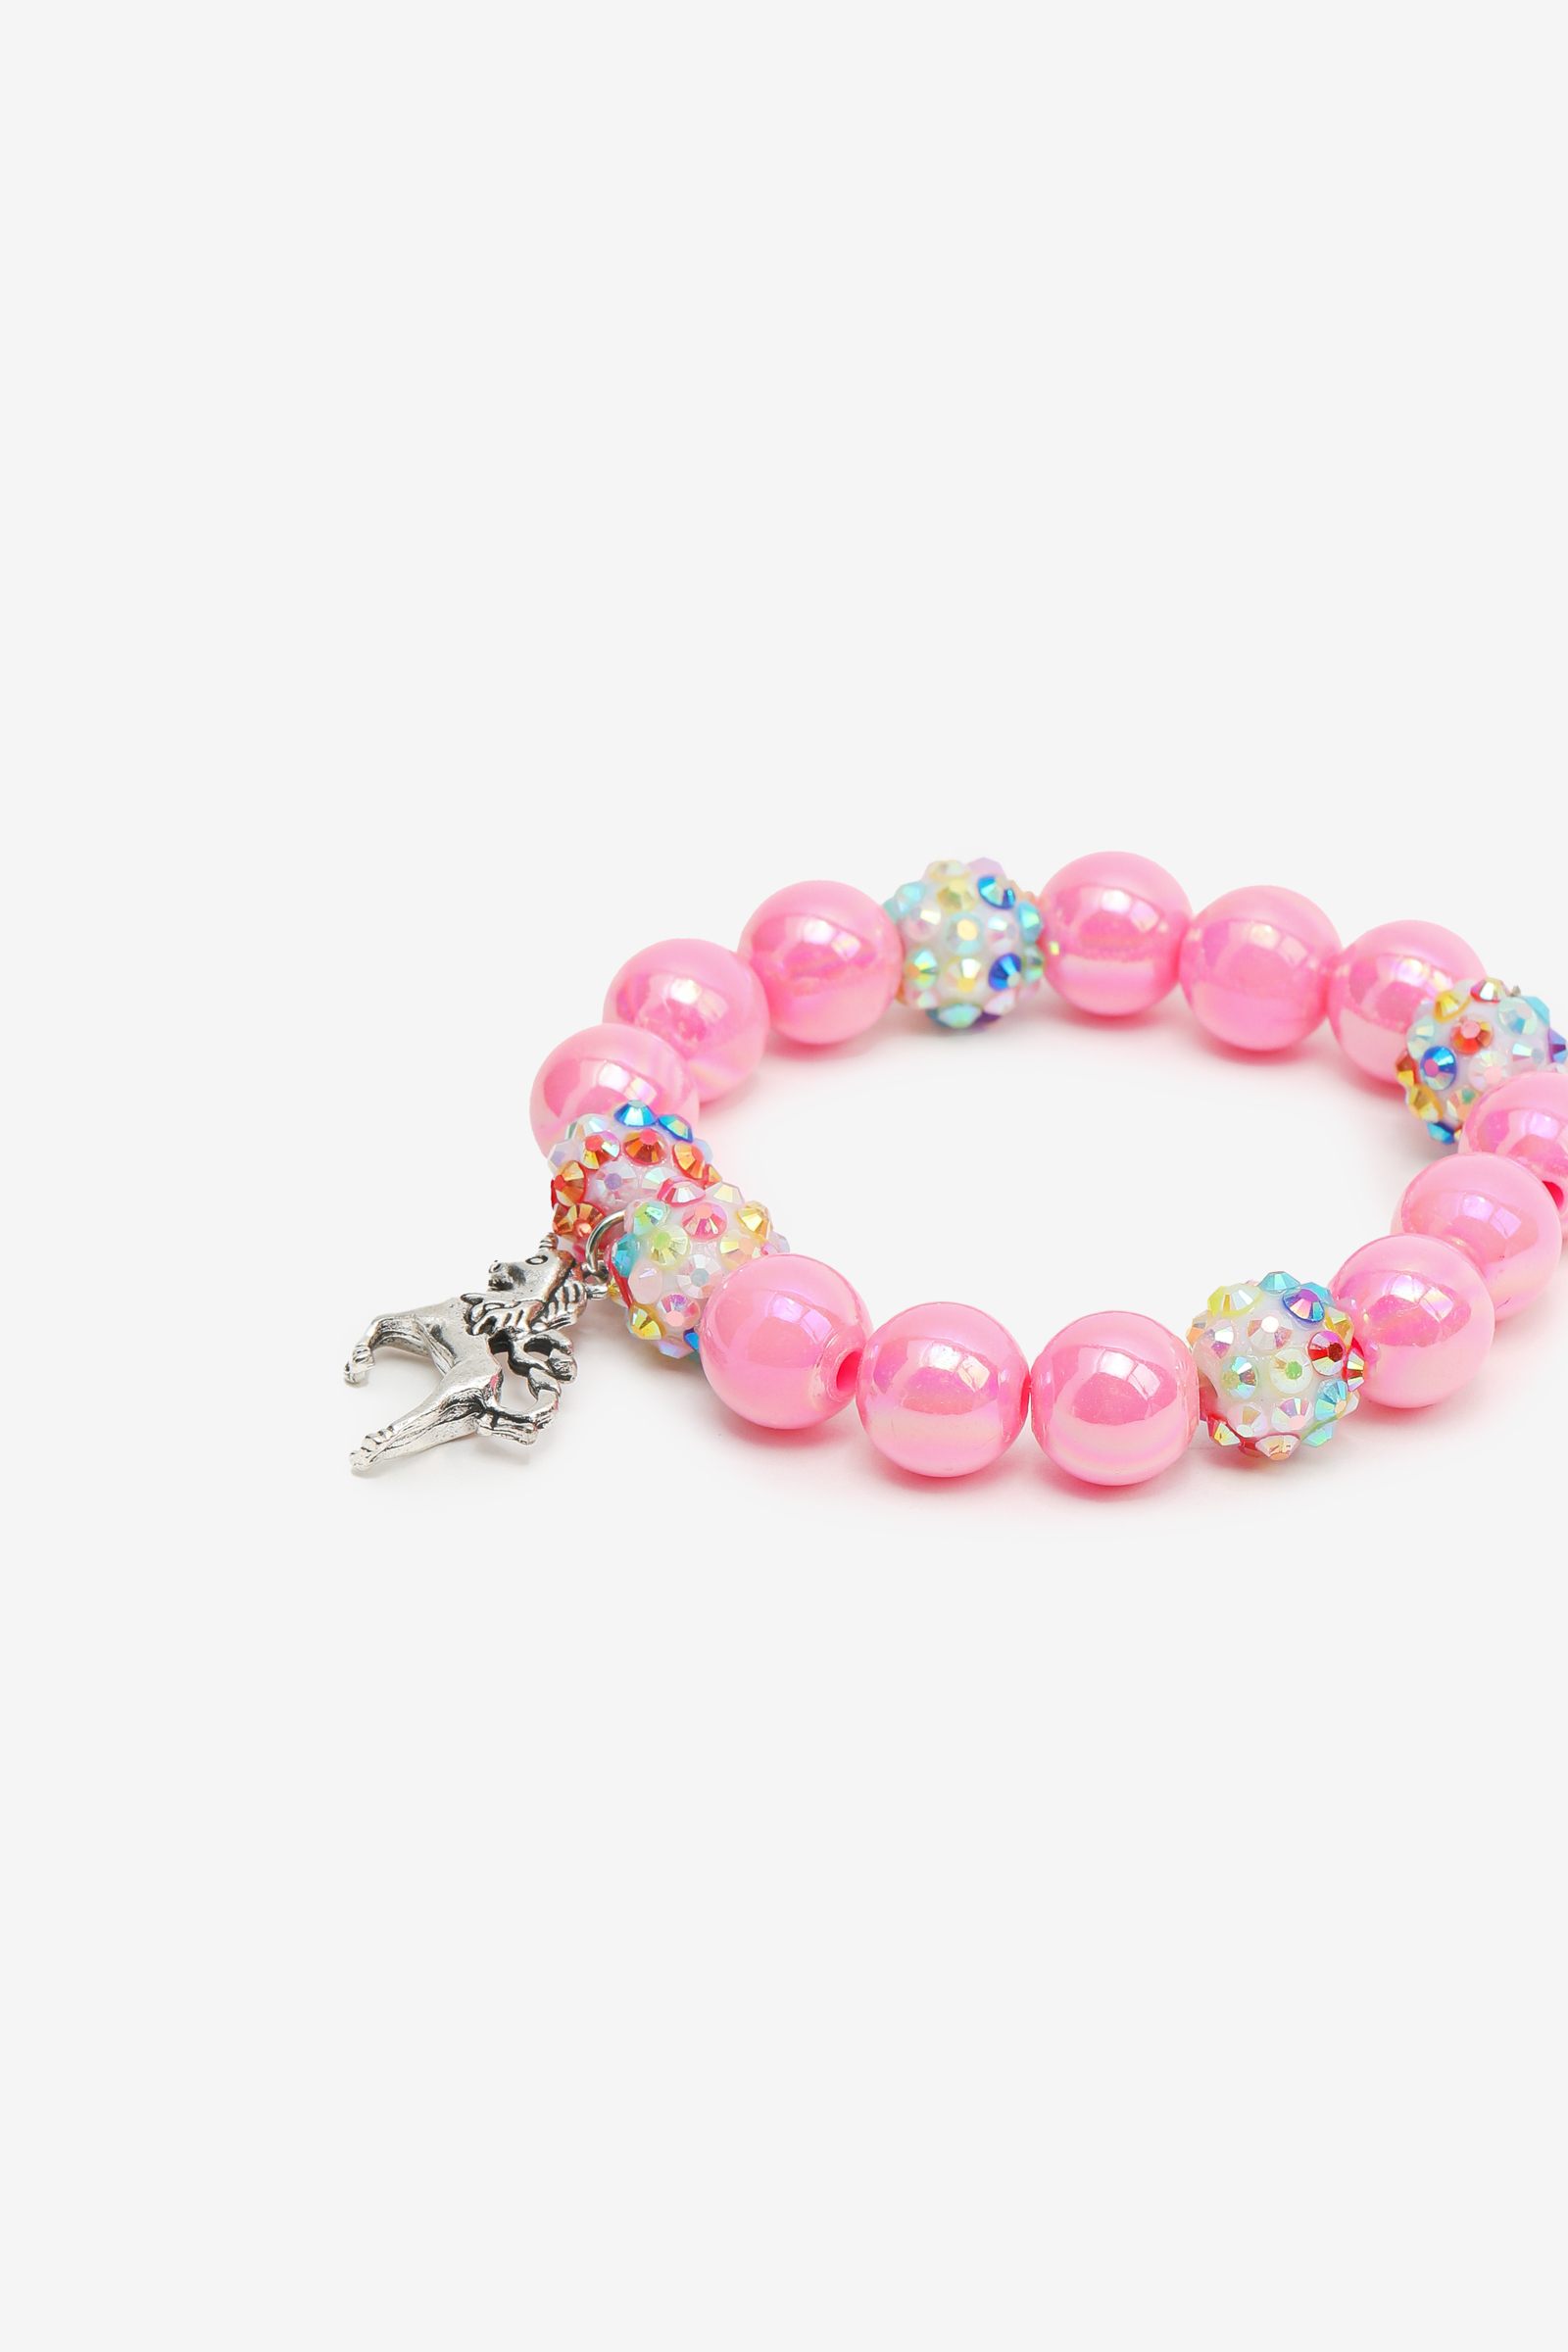 Beaded Bracelet with Unicorn Charm for Girls